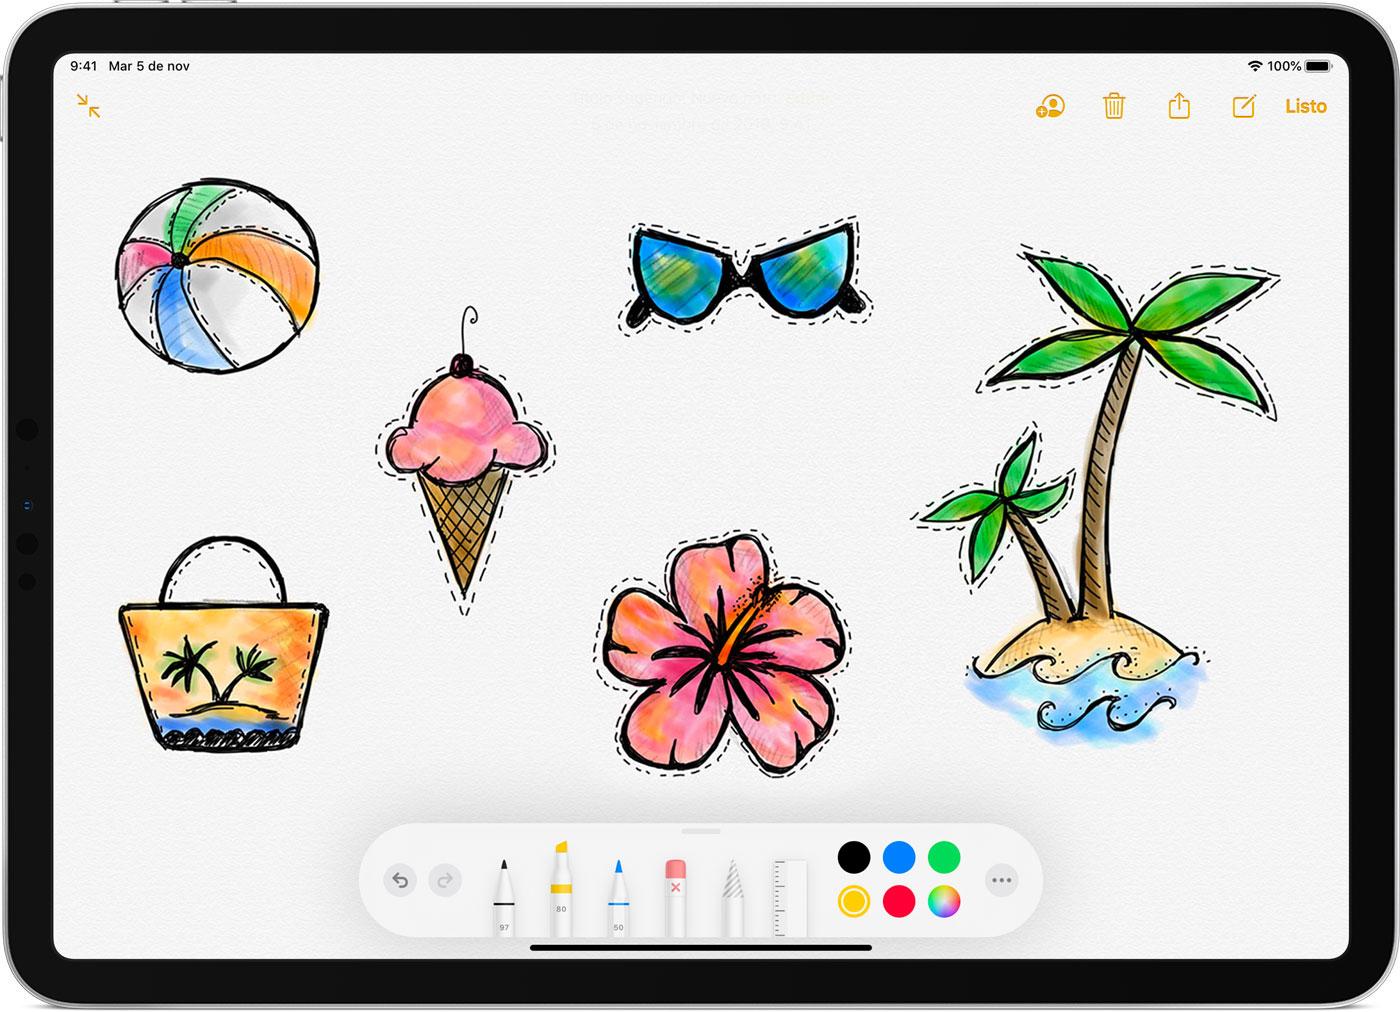 Usar Apple Pencil con tu iPad o iPad Pro - Soporte té